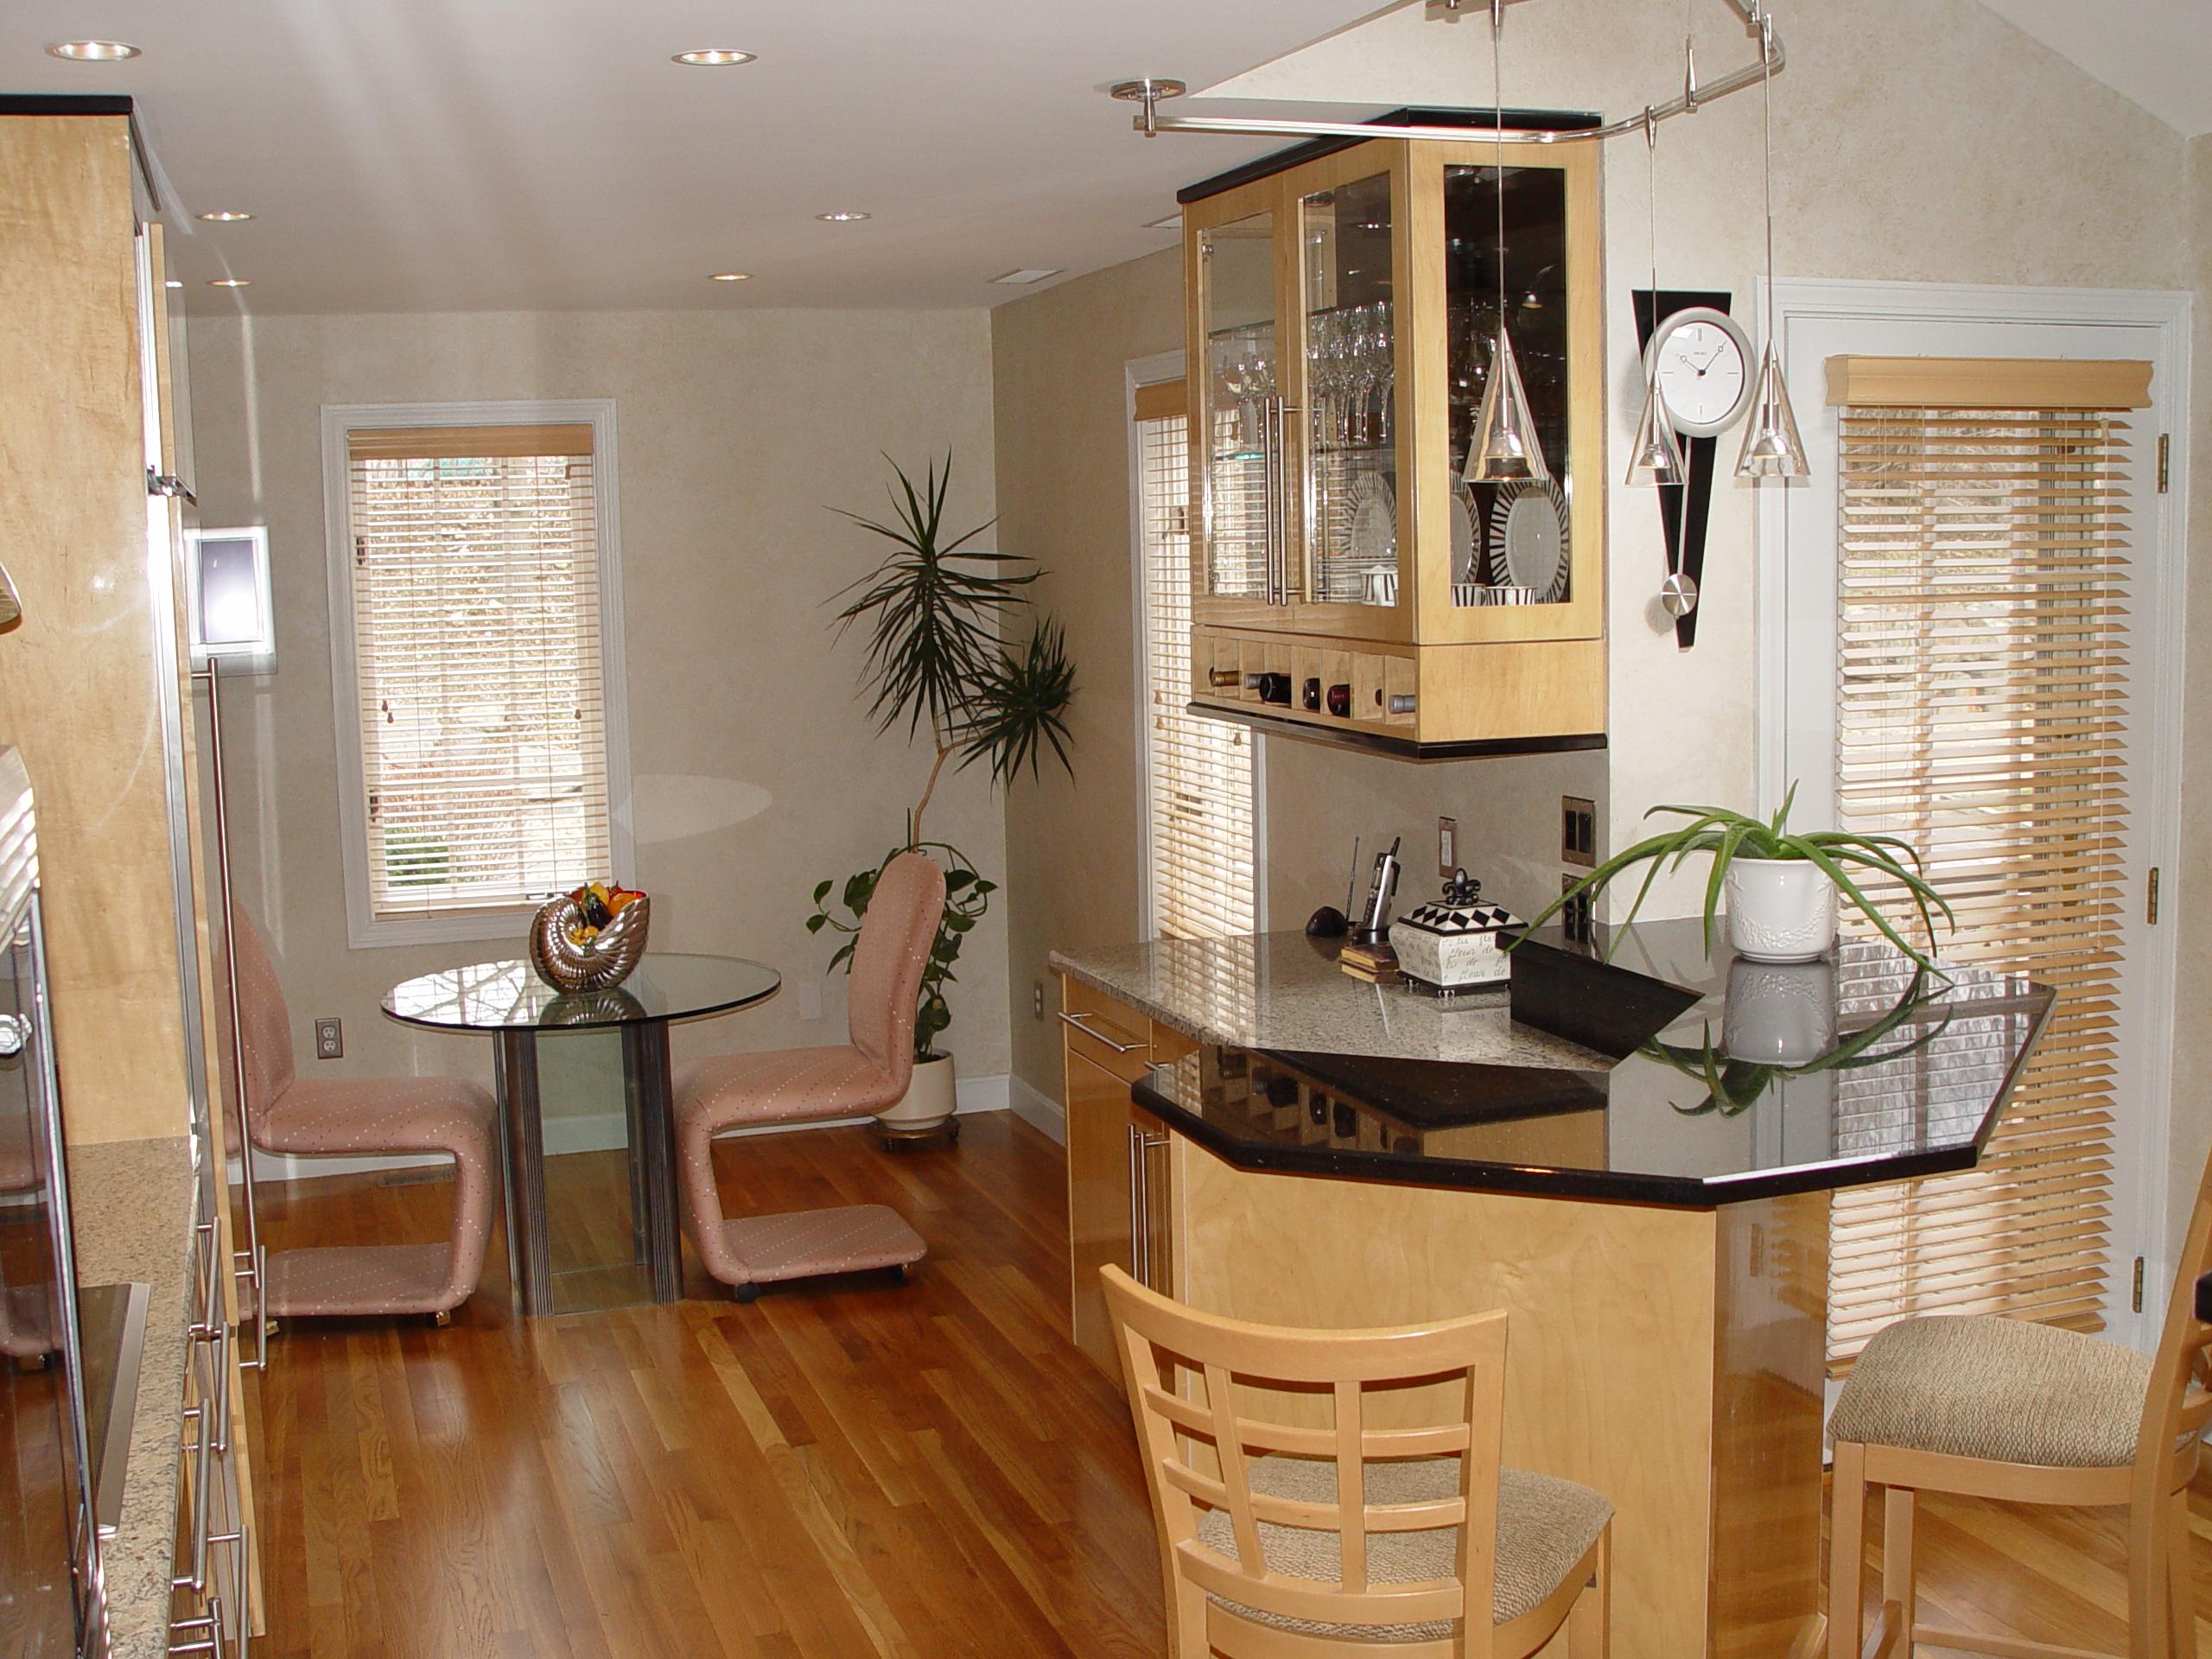 Fullsize Of National Kitchen And Bath Association